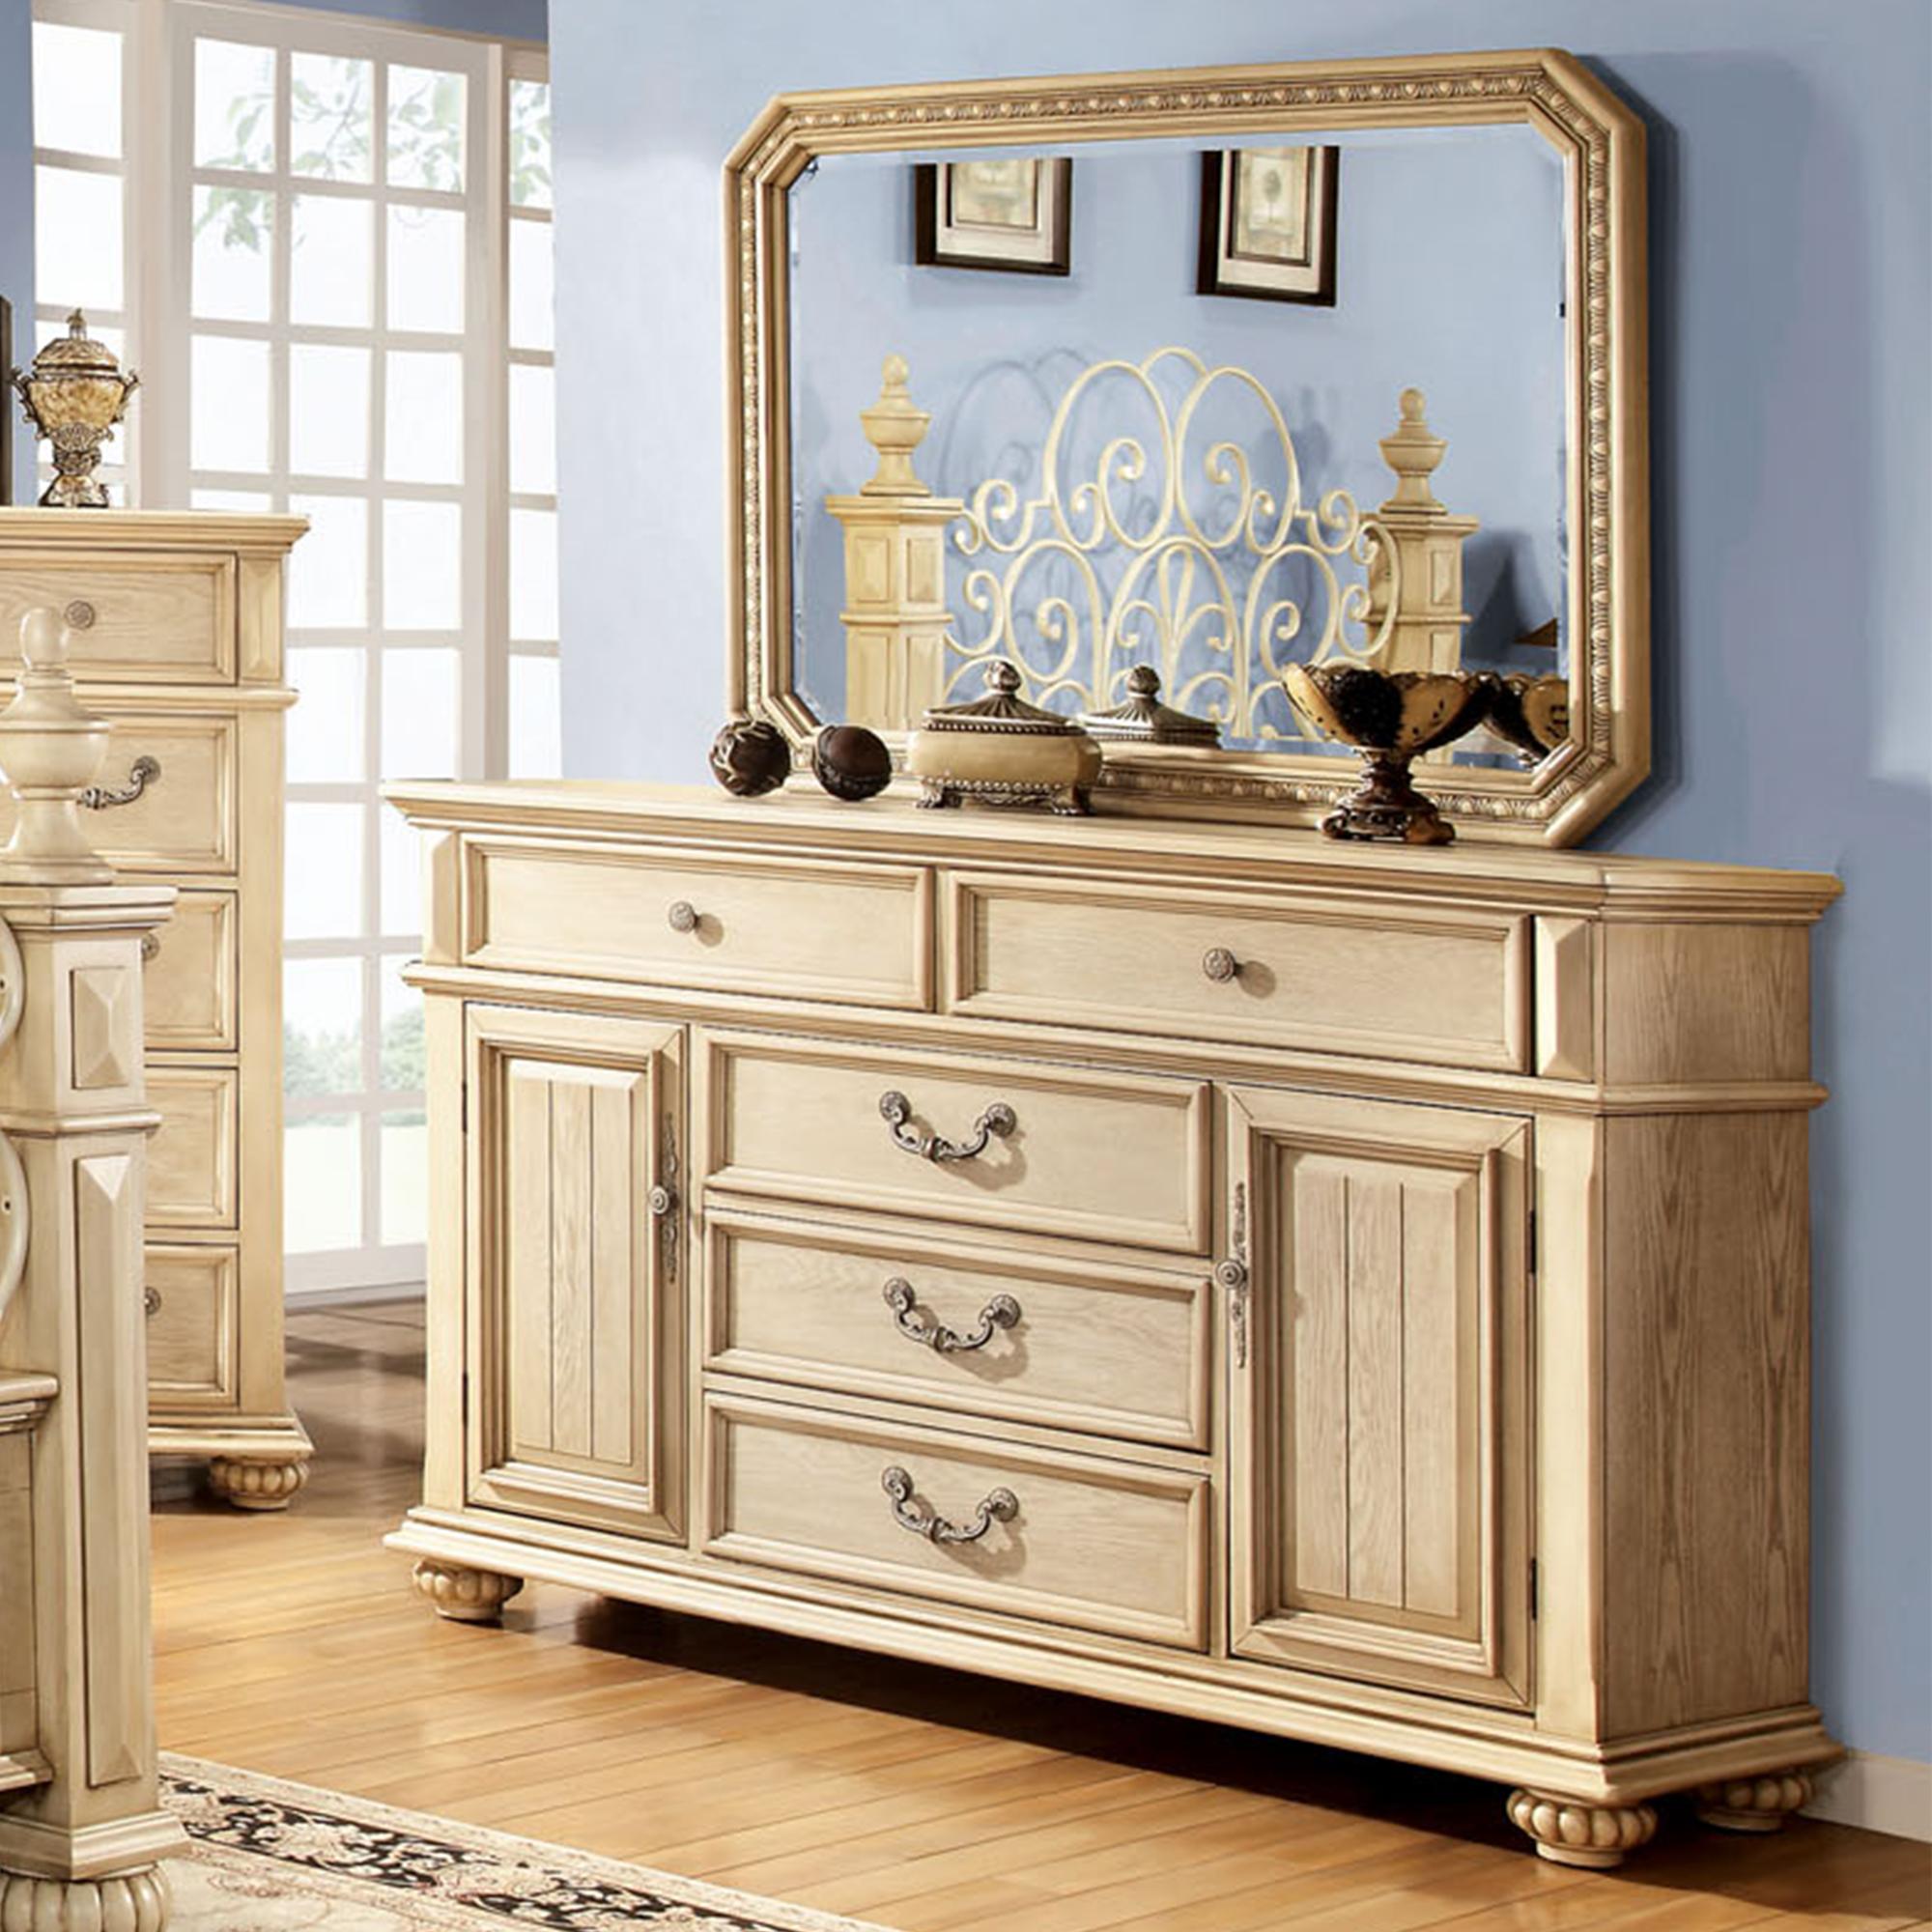 Furniture of America Pompine Antique White Dresser with Mirror